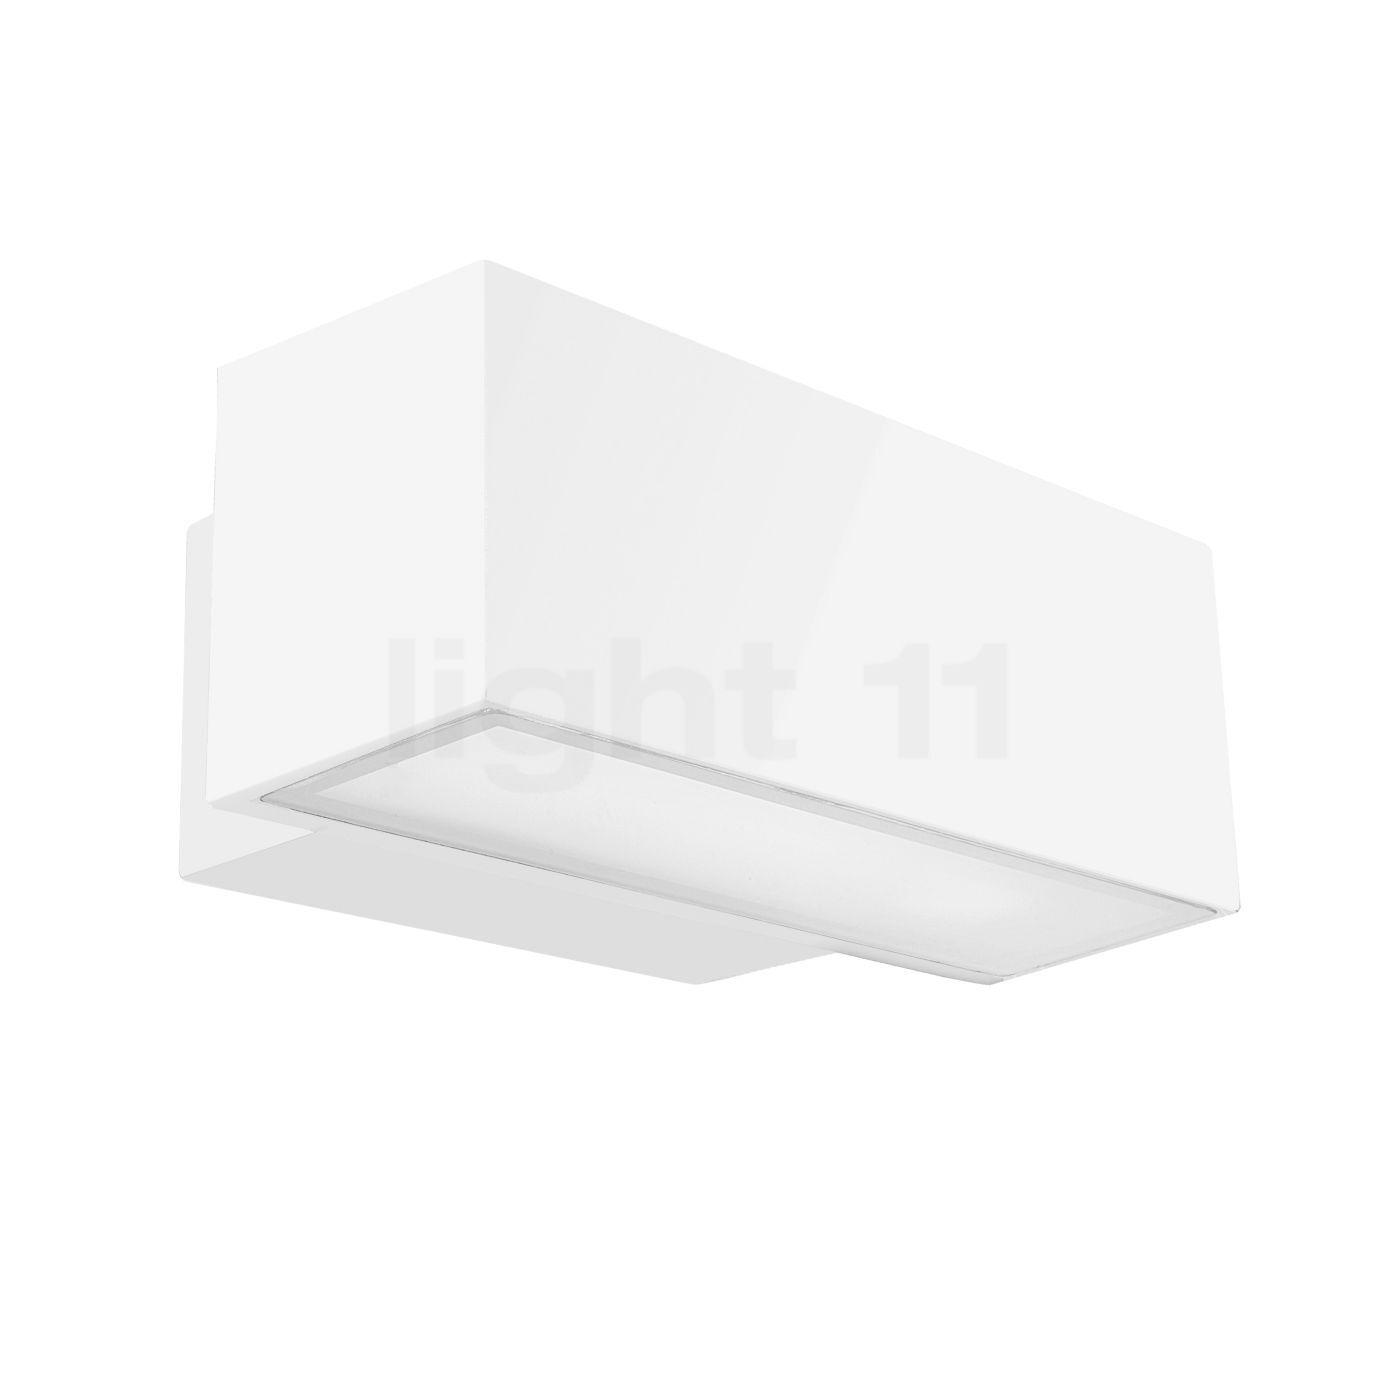 LEDS-C4 Afrodita 19W Applique LED, blanc , Vente d'entrepôt, neuf, emballage d'origine